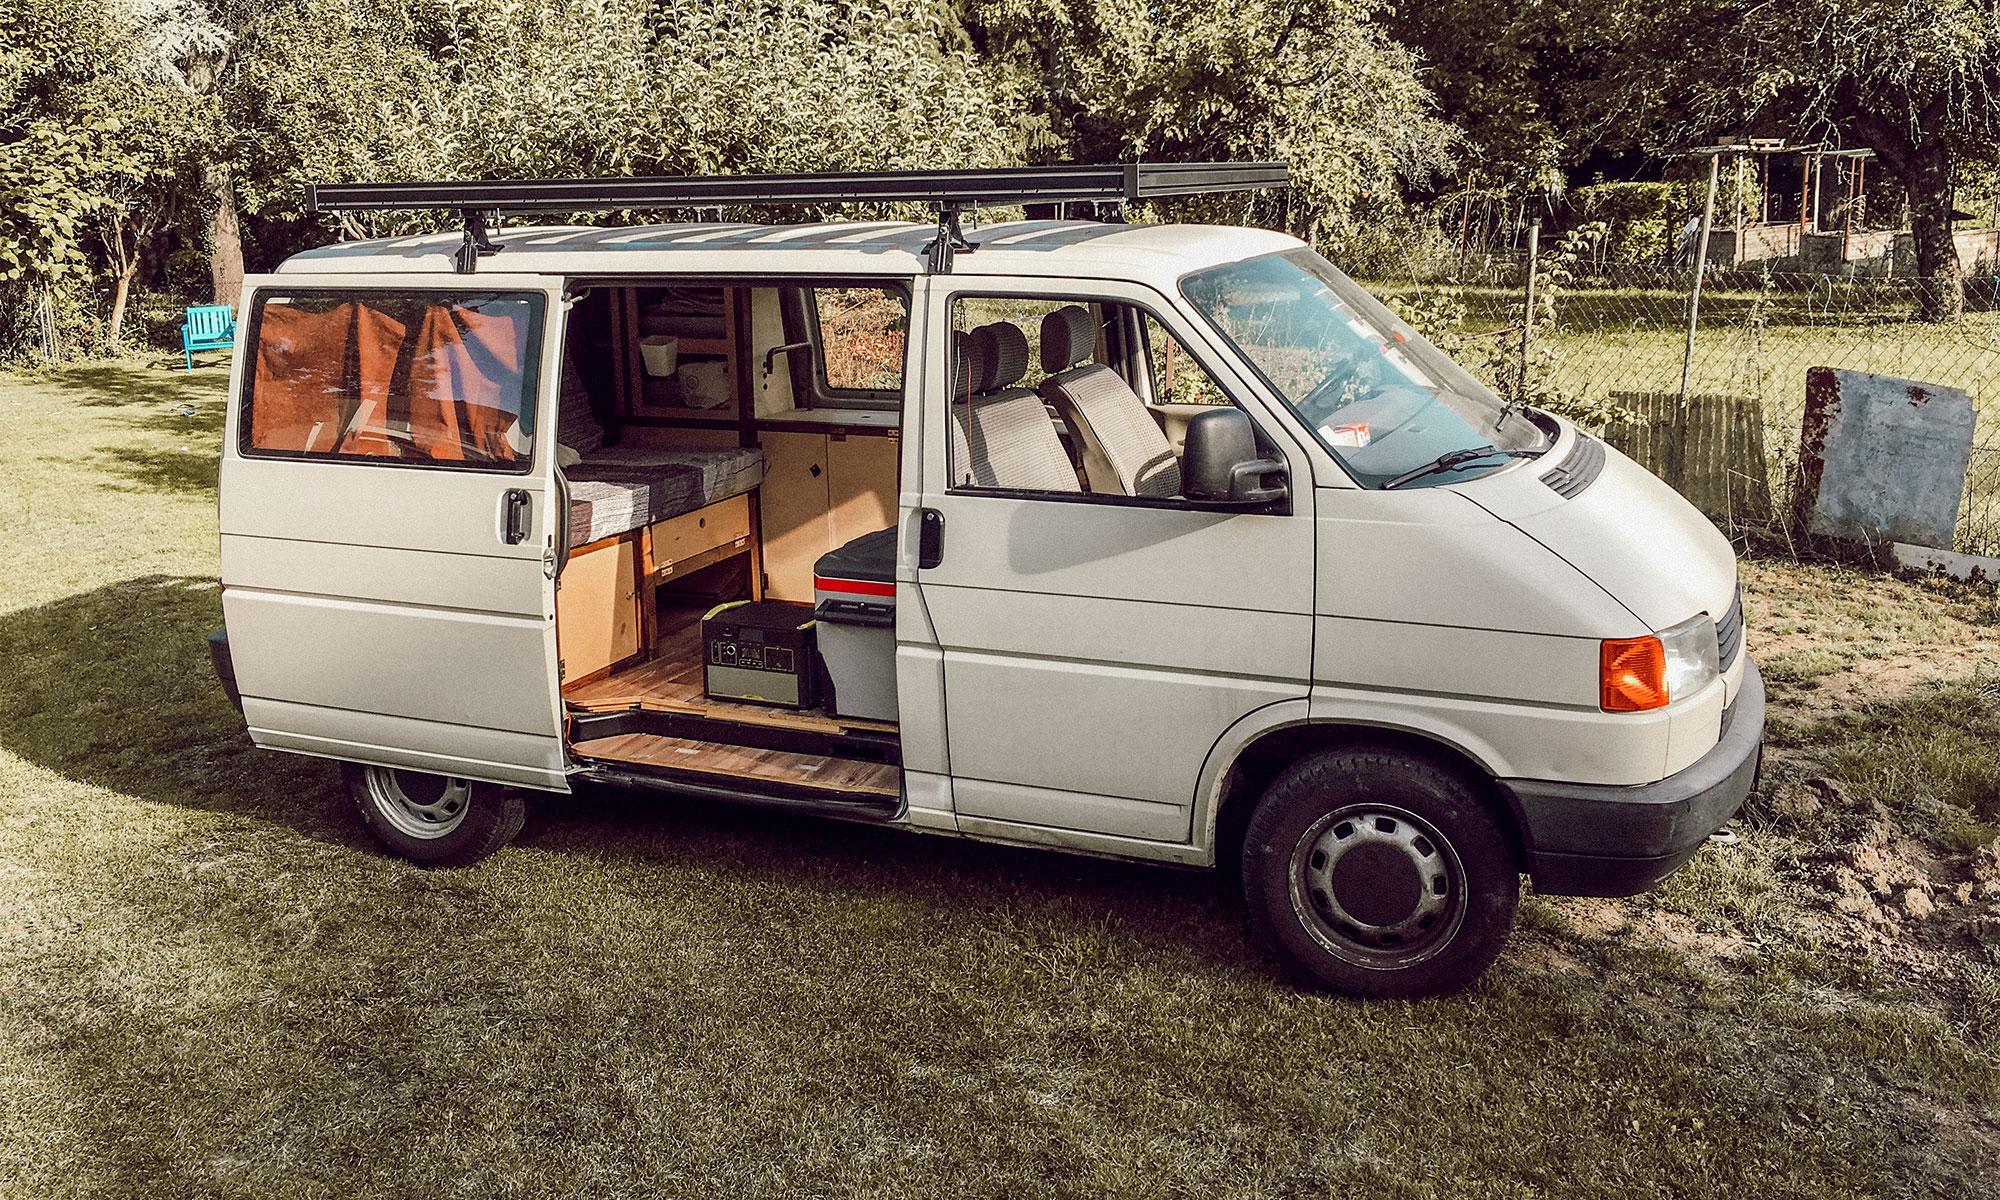 Van Roof Racks >> An Aluminium Roof Rack A Must Have For Your Vw Camper Van